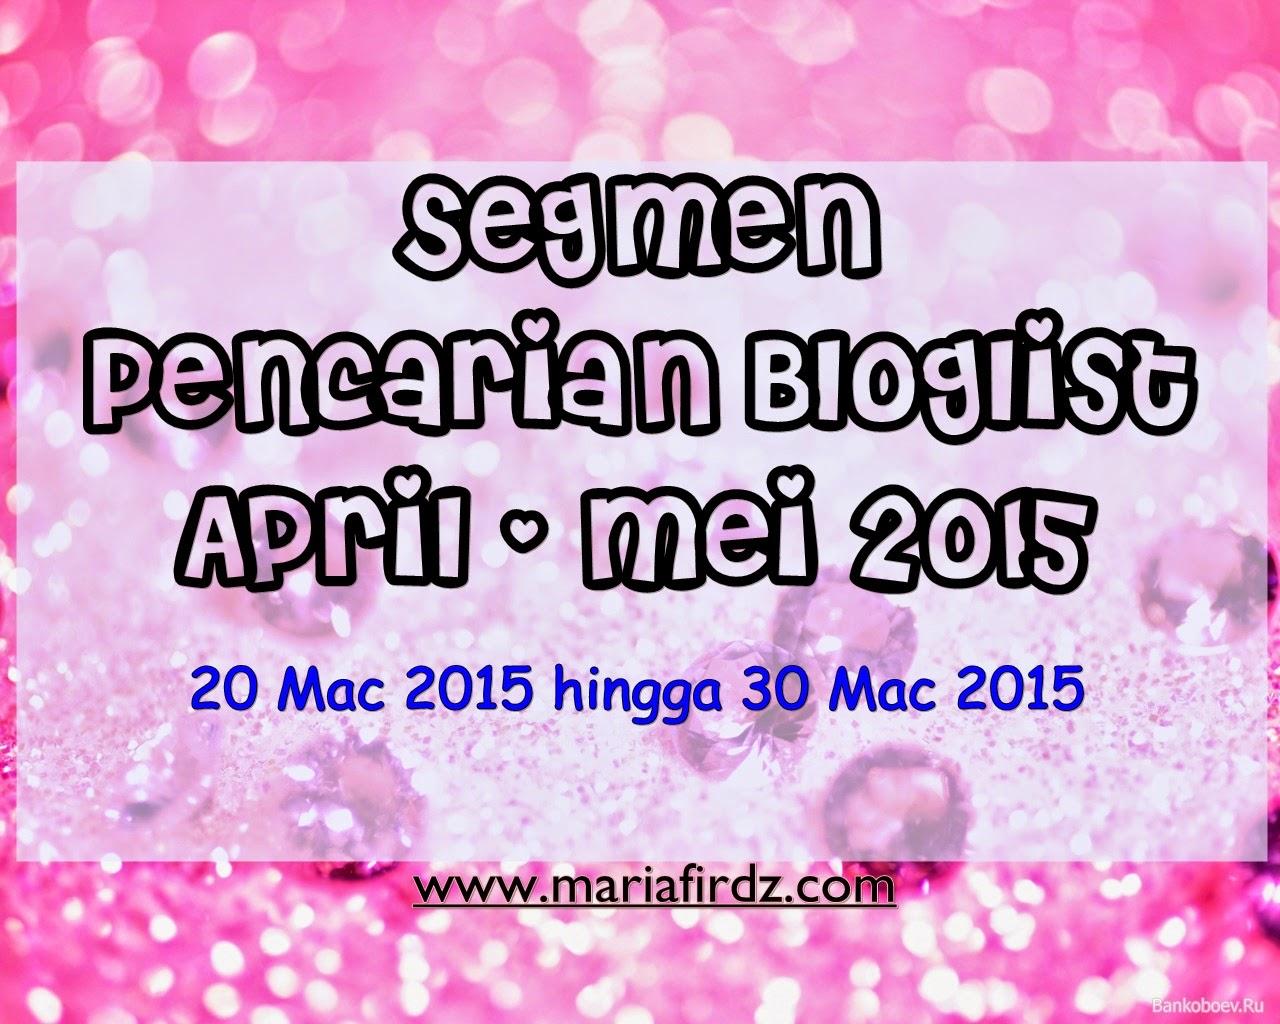 Segmen Pencarian Bloglist April - Mei 2015